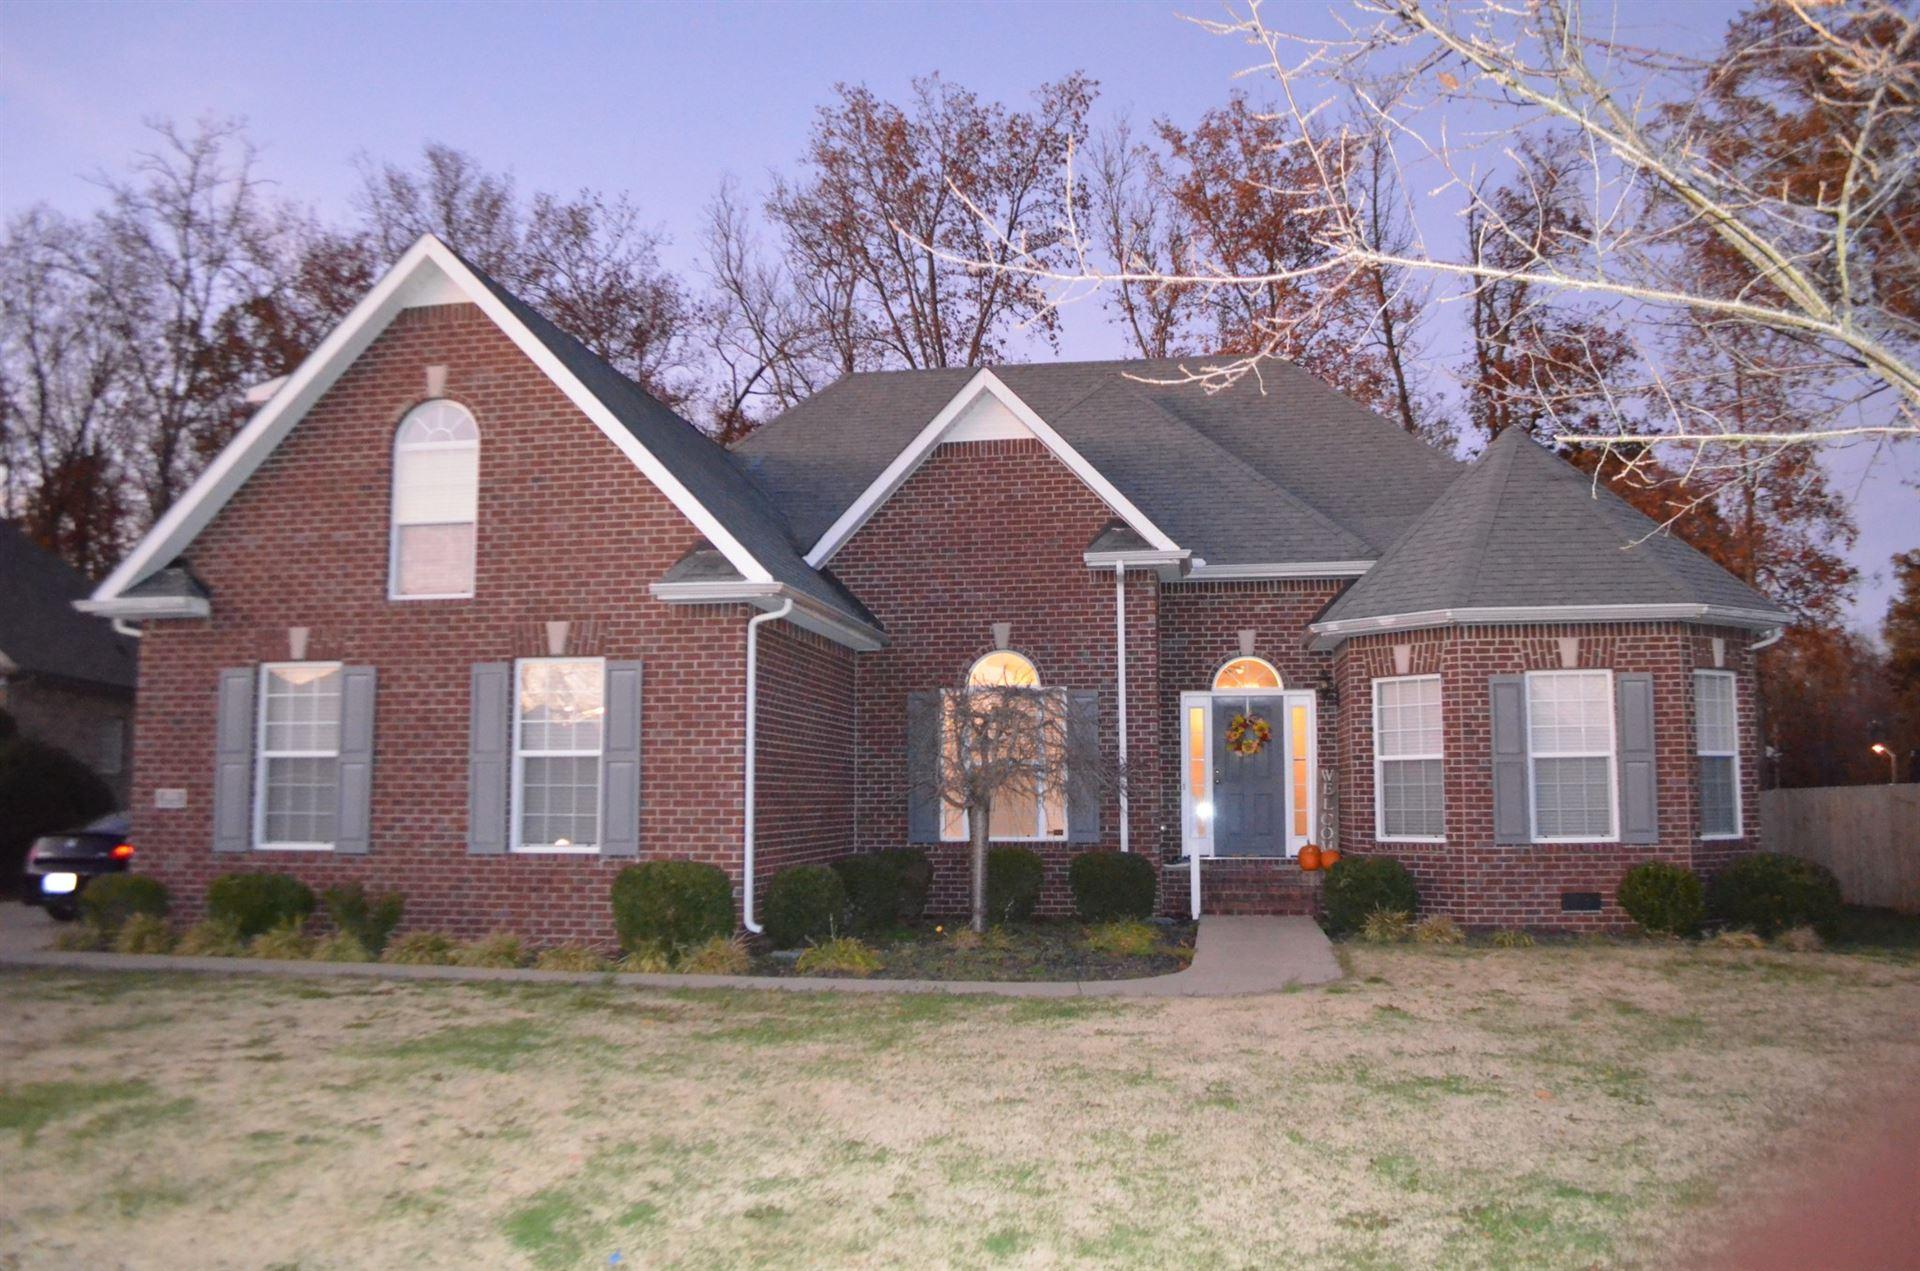 4708 Smitty Dr, Murfreesboro, TN 37128 - MLS#: 2208574